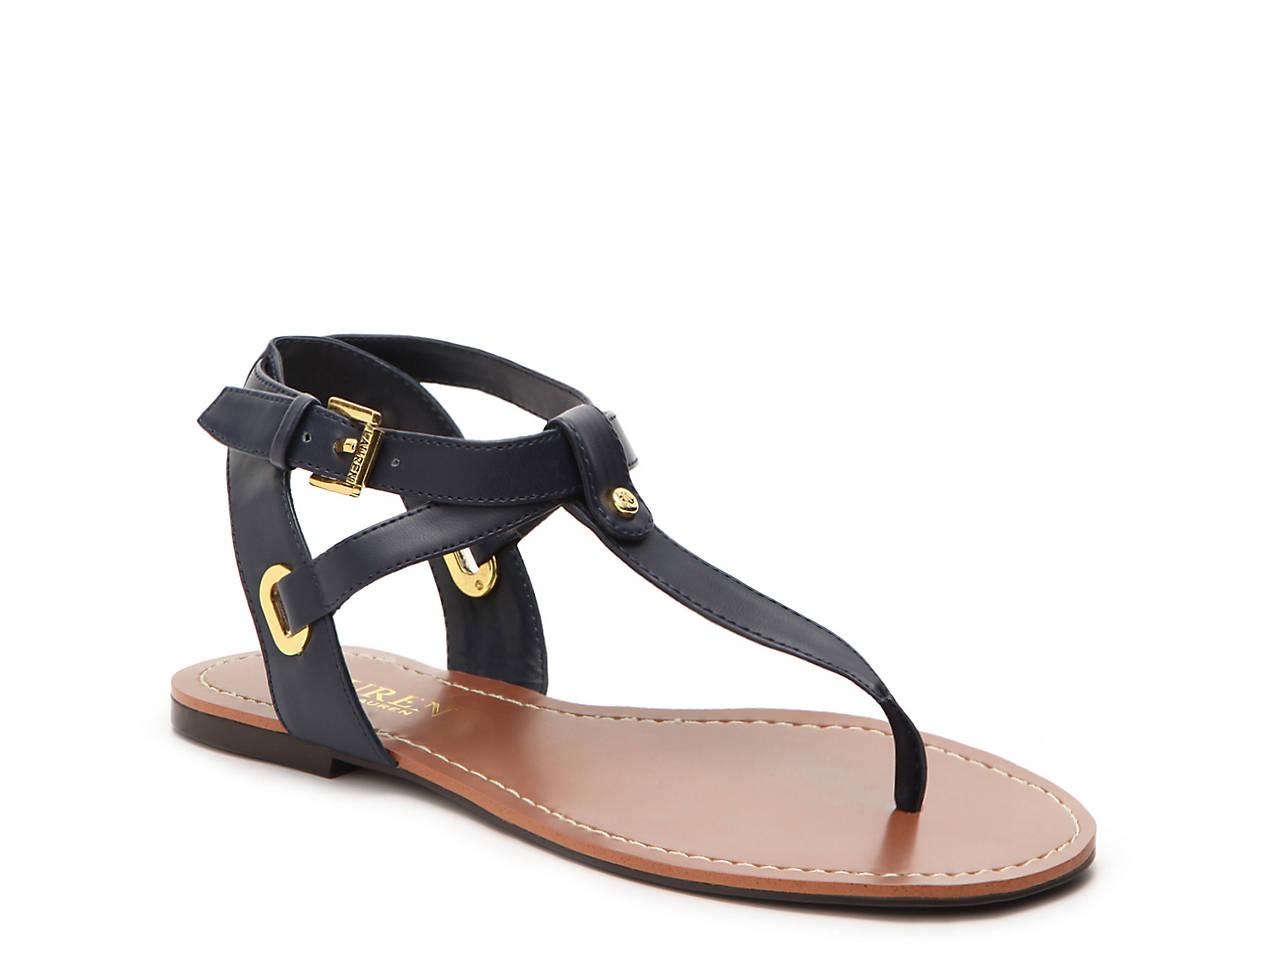 0b27fad9c4e6 Lauren Ralph Lauren Adina Flat Sandal Women s Shoes